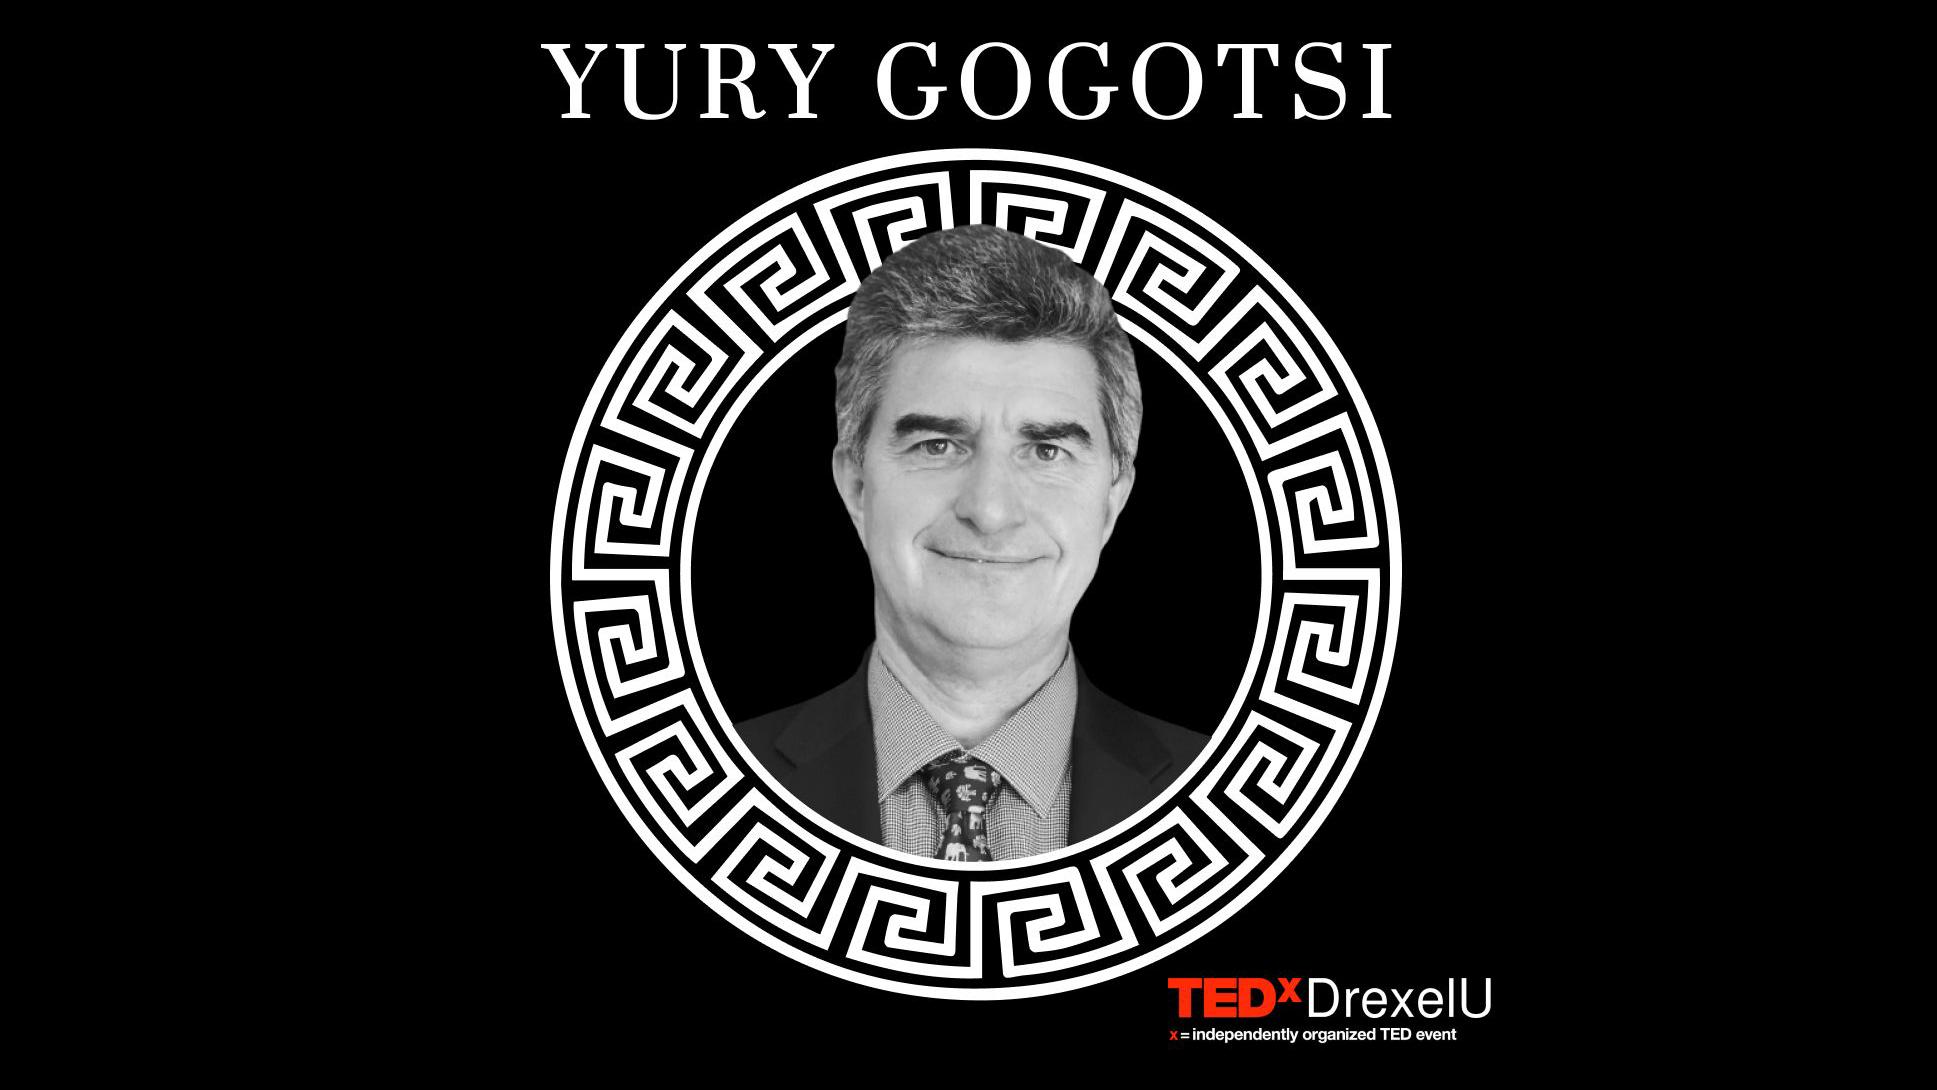 Professor Yury Gogotsi Giving TED Talk at TEDxDrexelU Conference